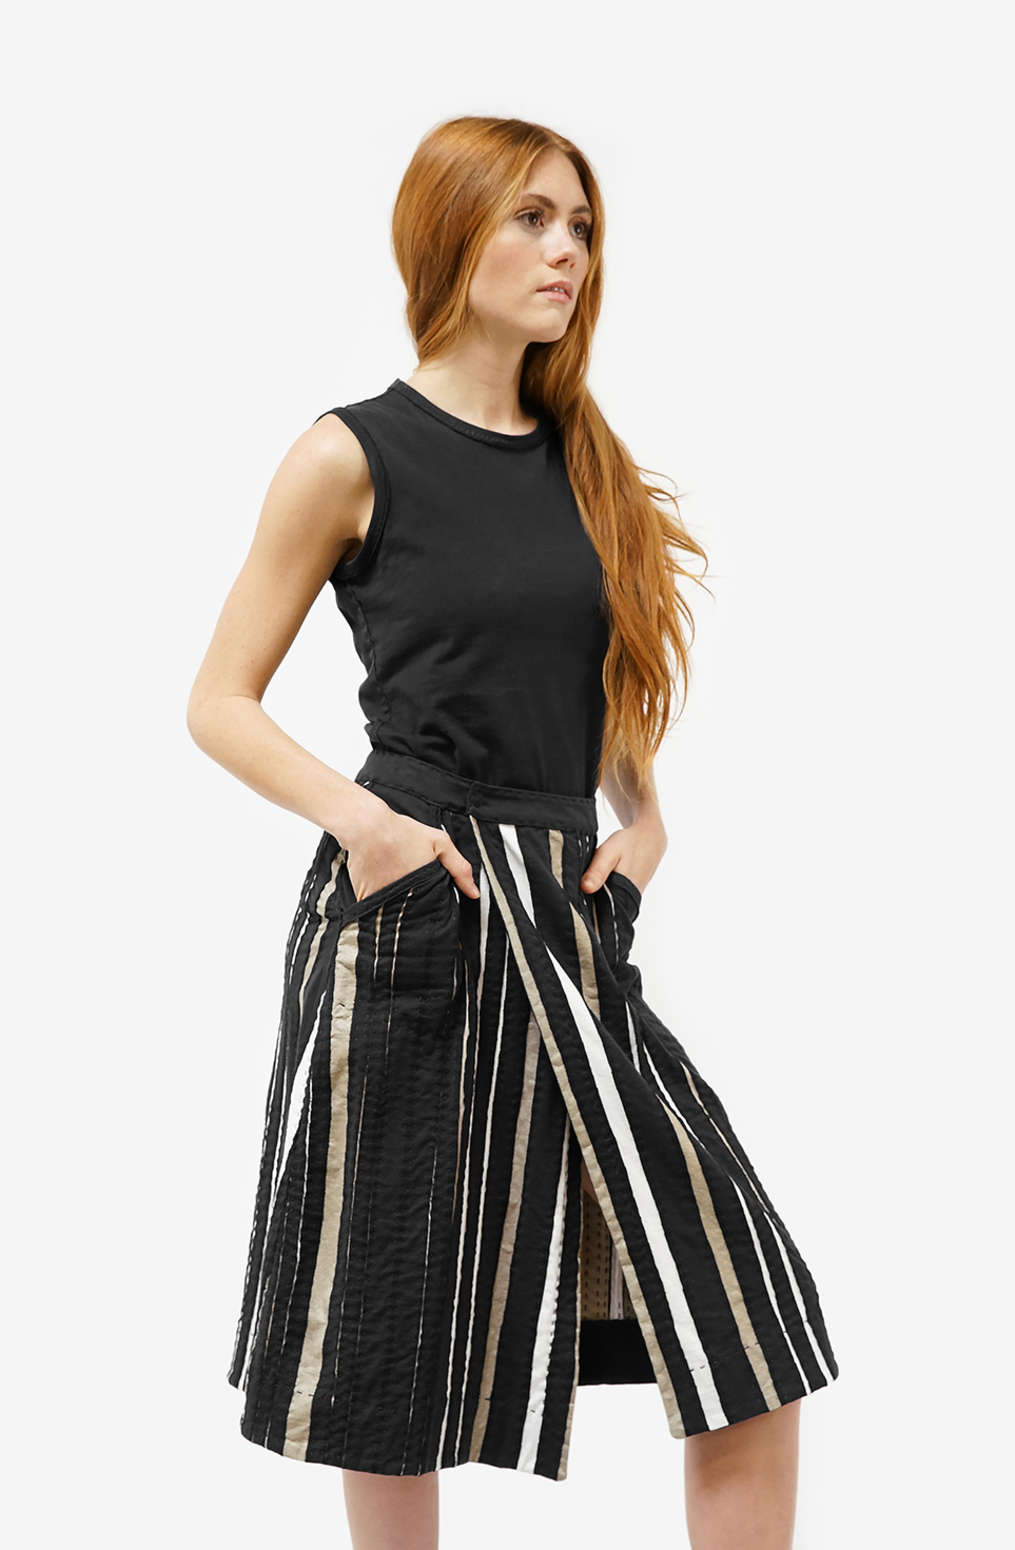 Alabama chanin womens striped wrap organic cotton skirt 3